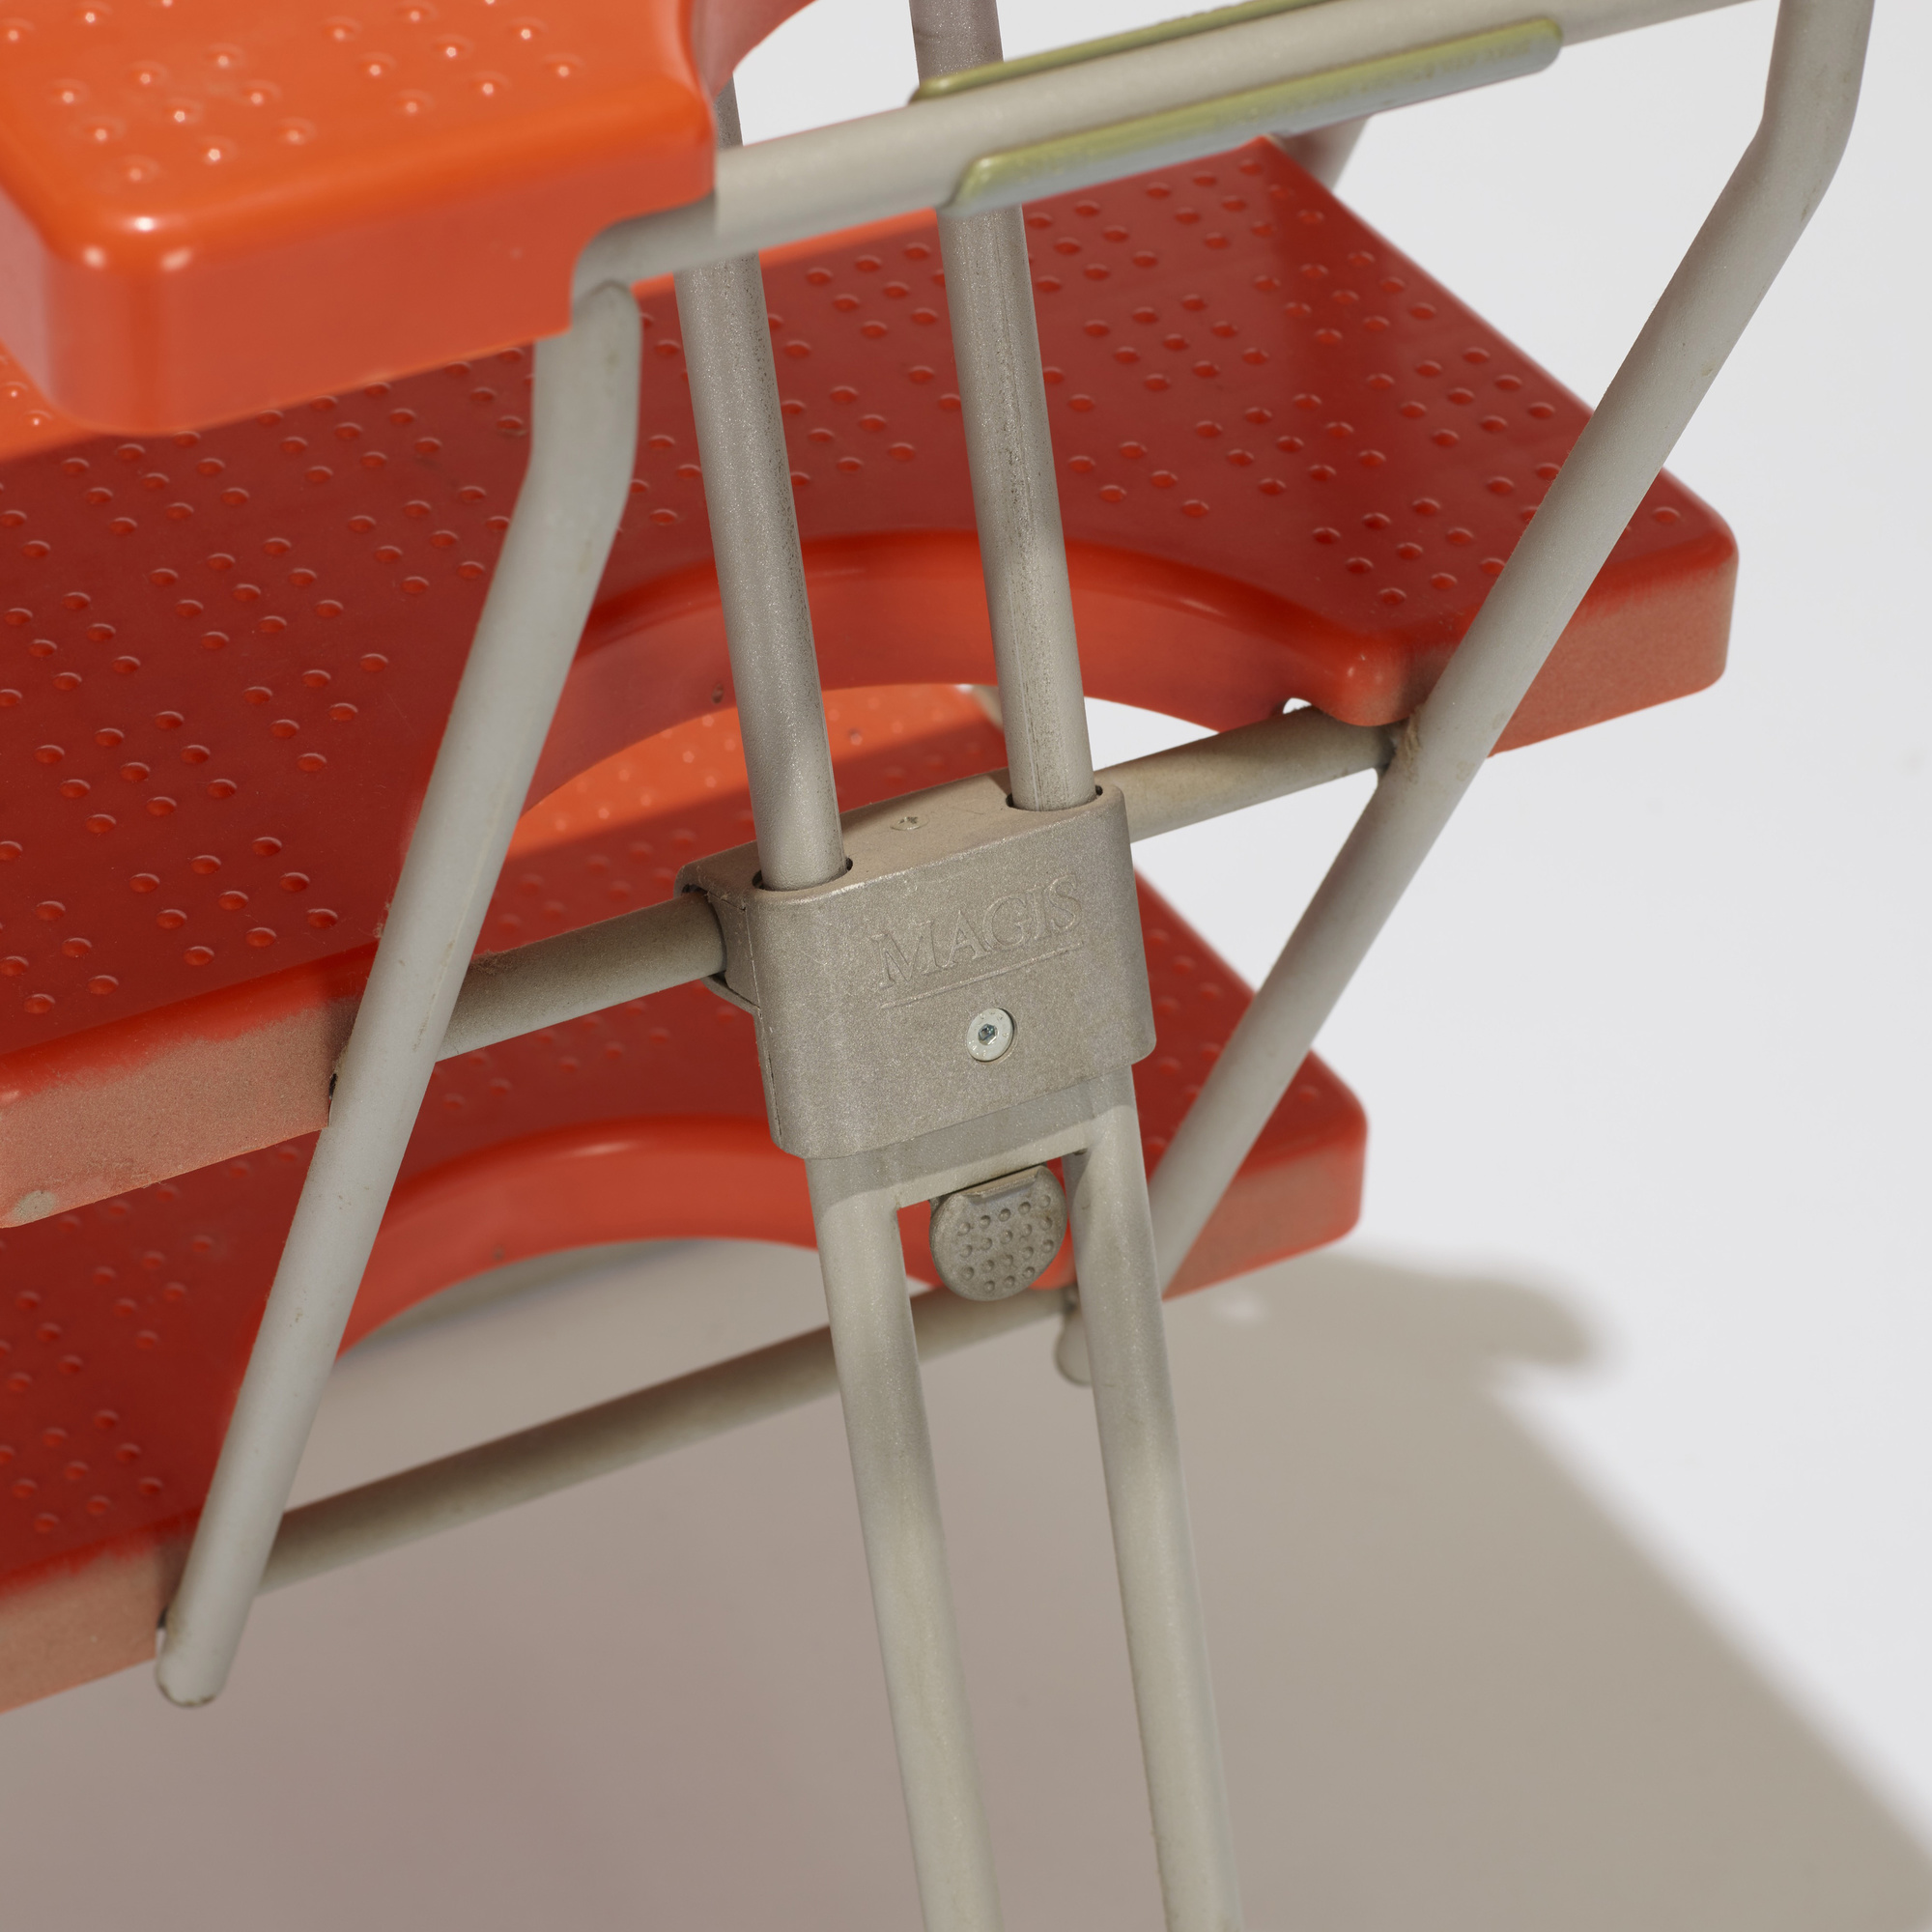 340: Andries and Hiroko Van Ock / Nuovastep folding step-ladder (3 of 3)